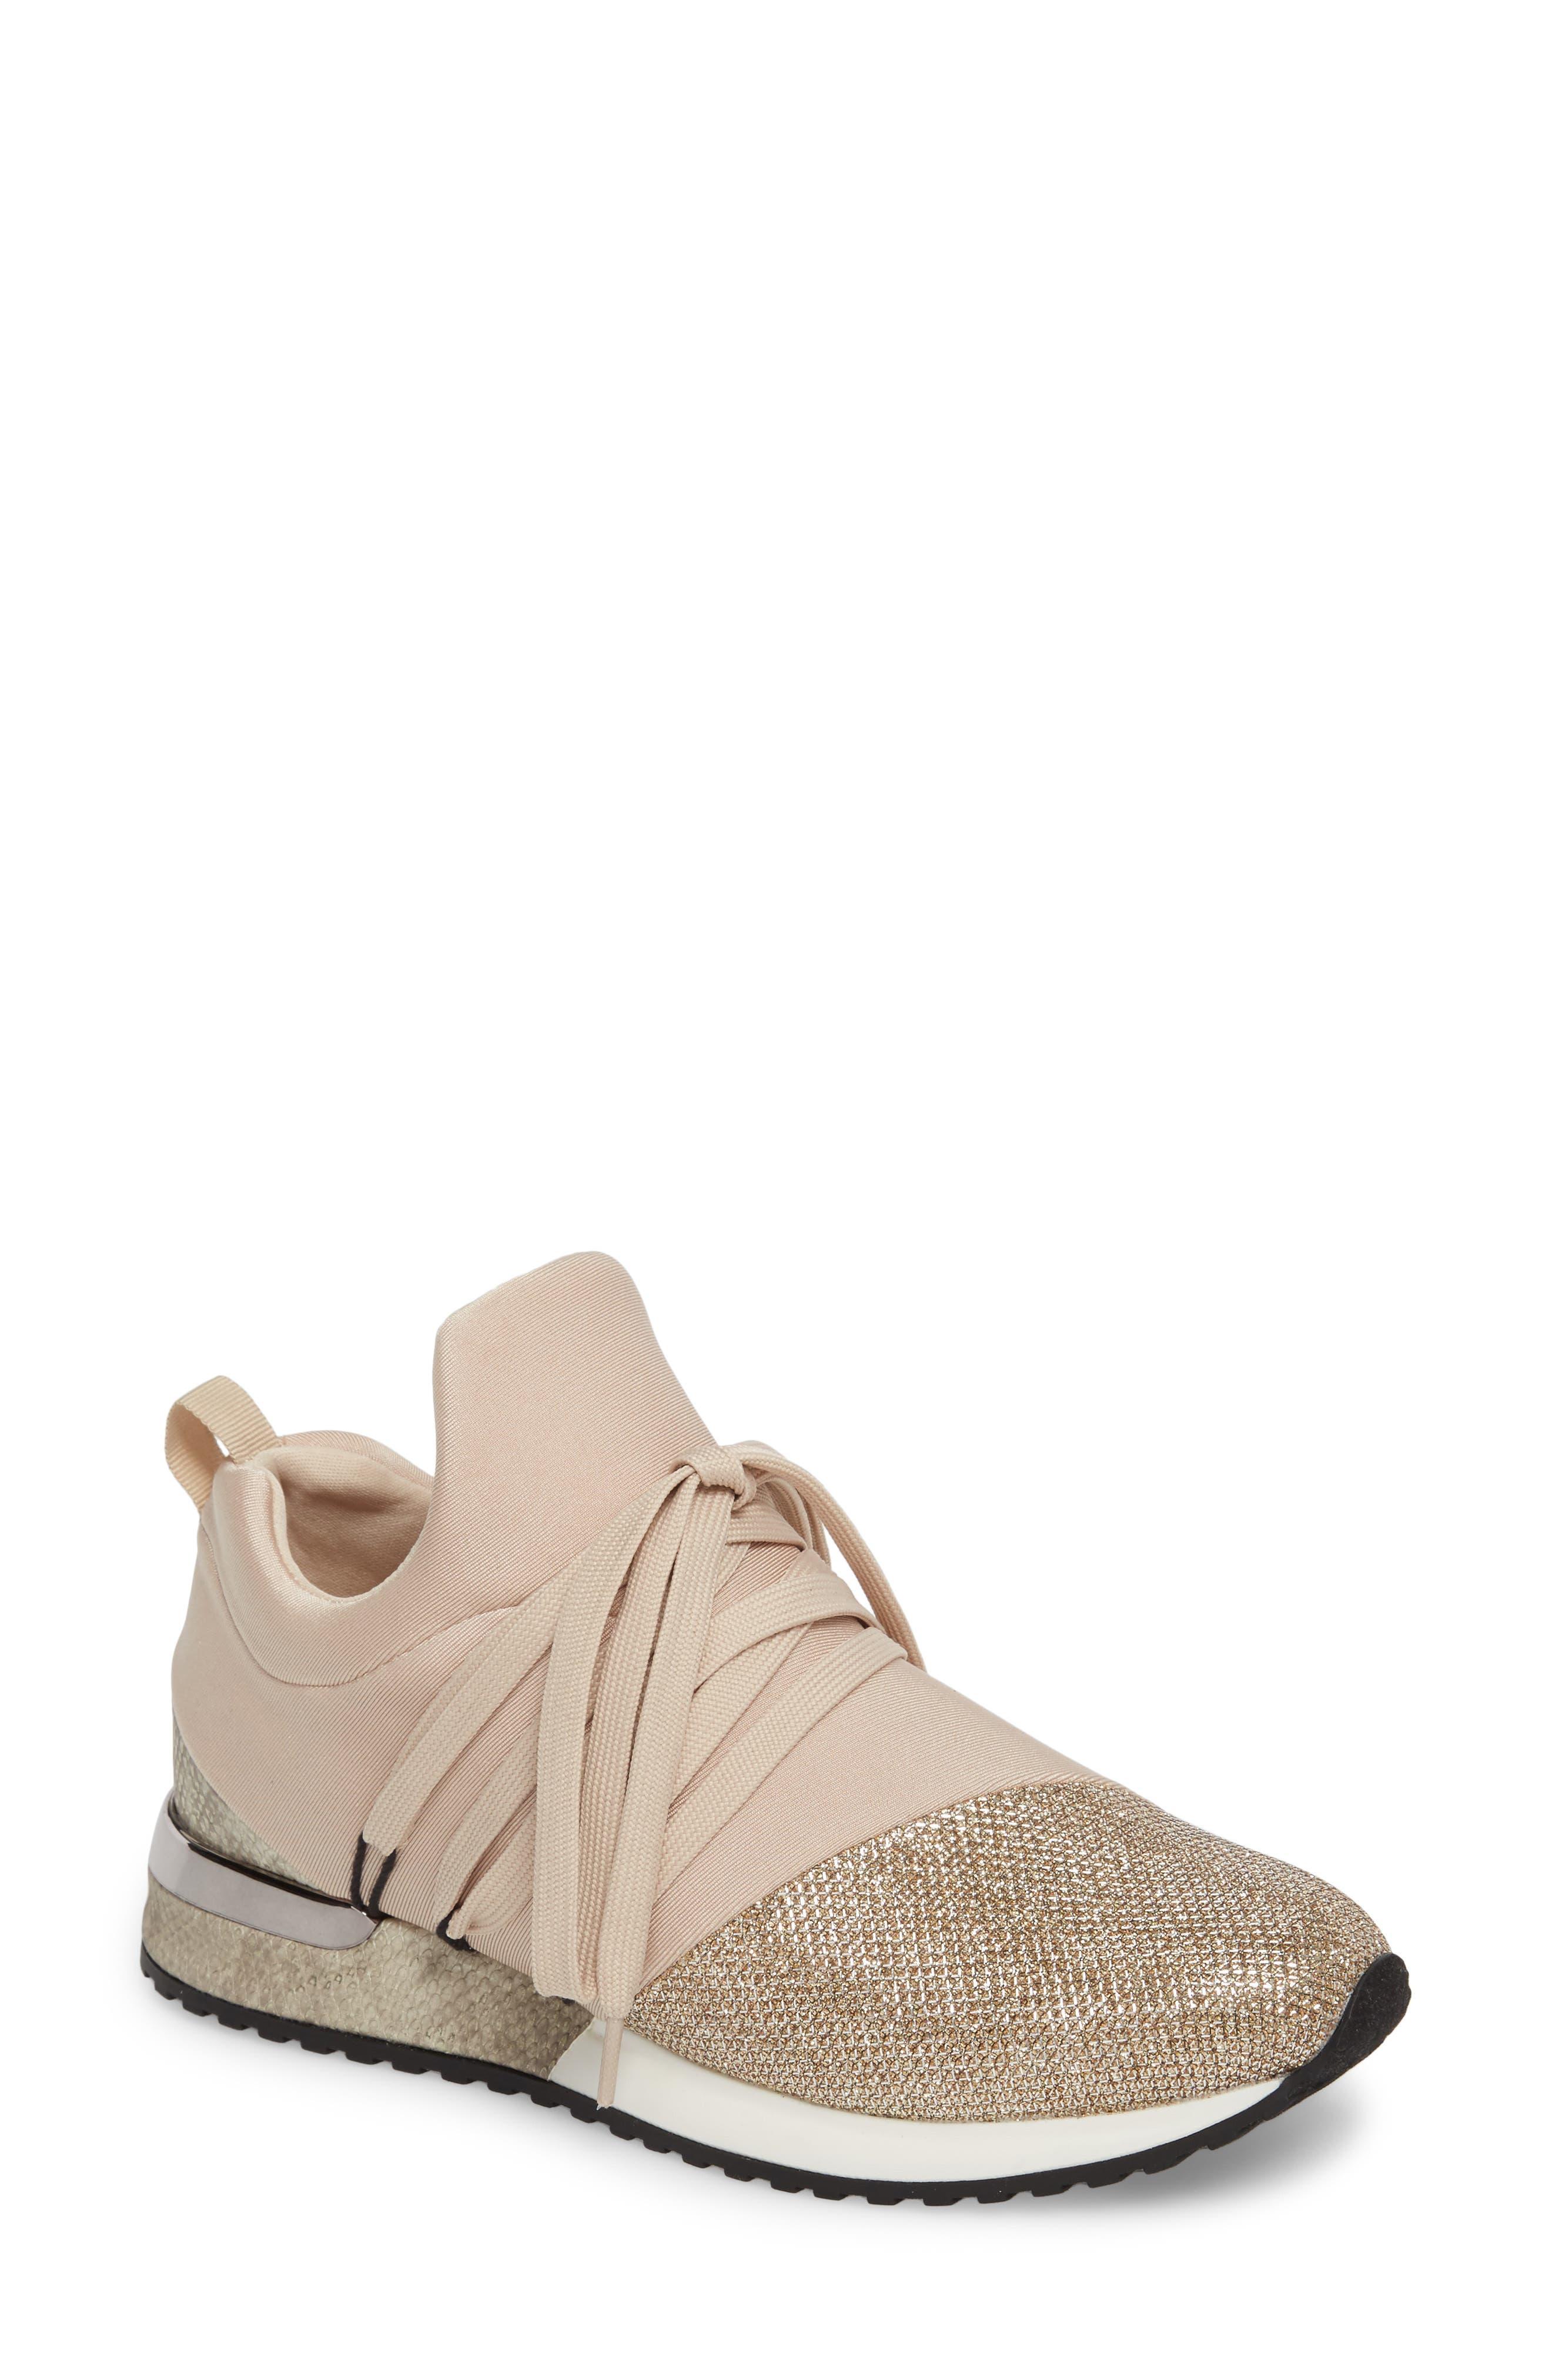 Jslides Zorro Sneaker, Metallic